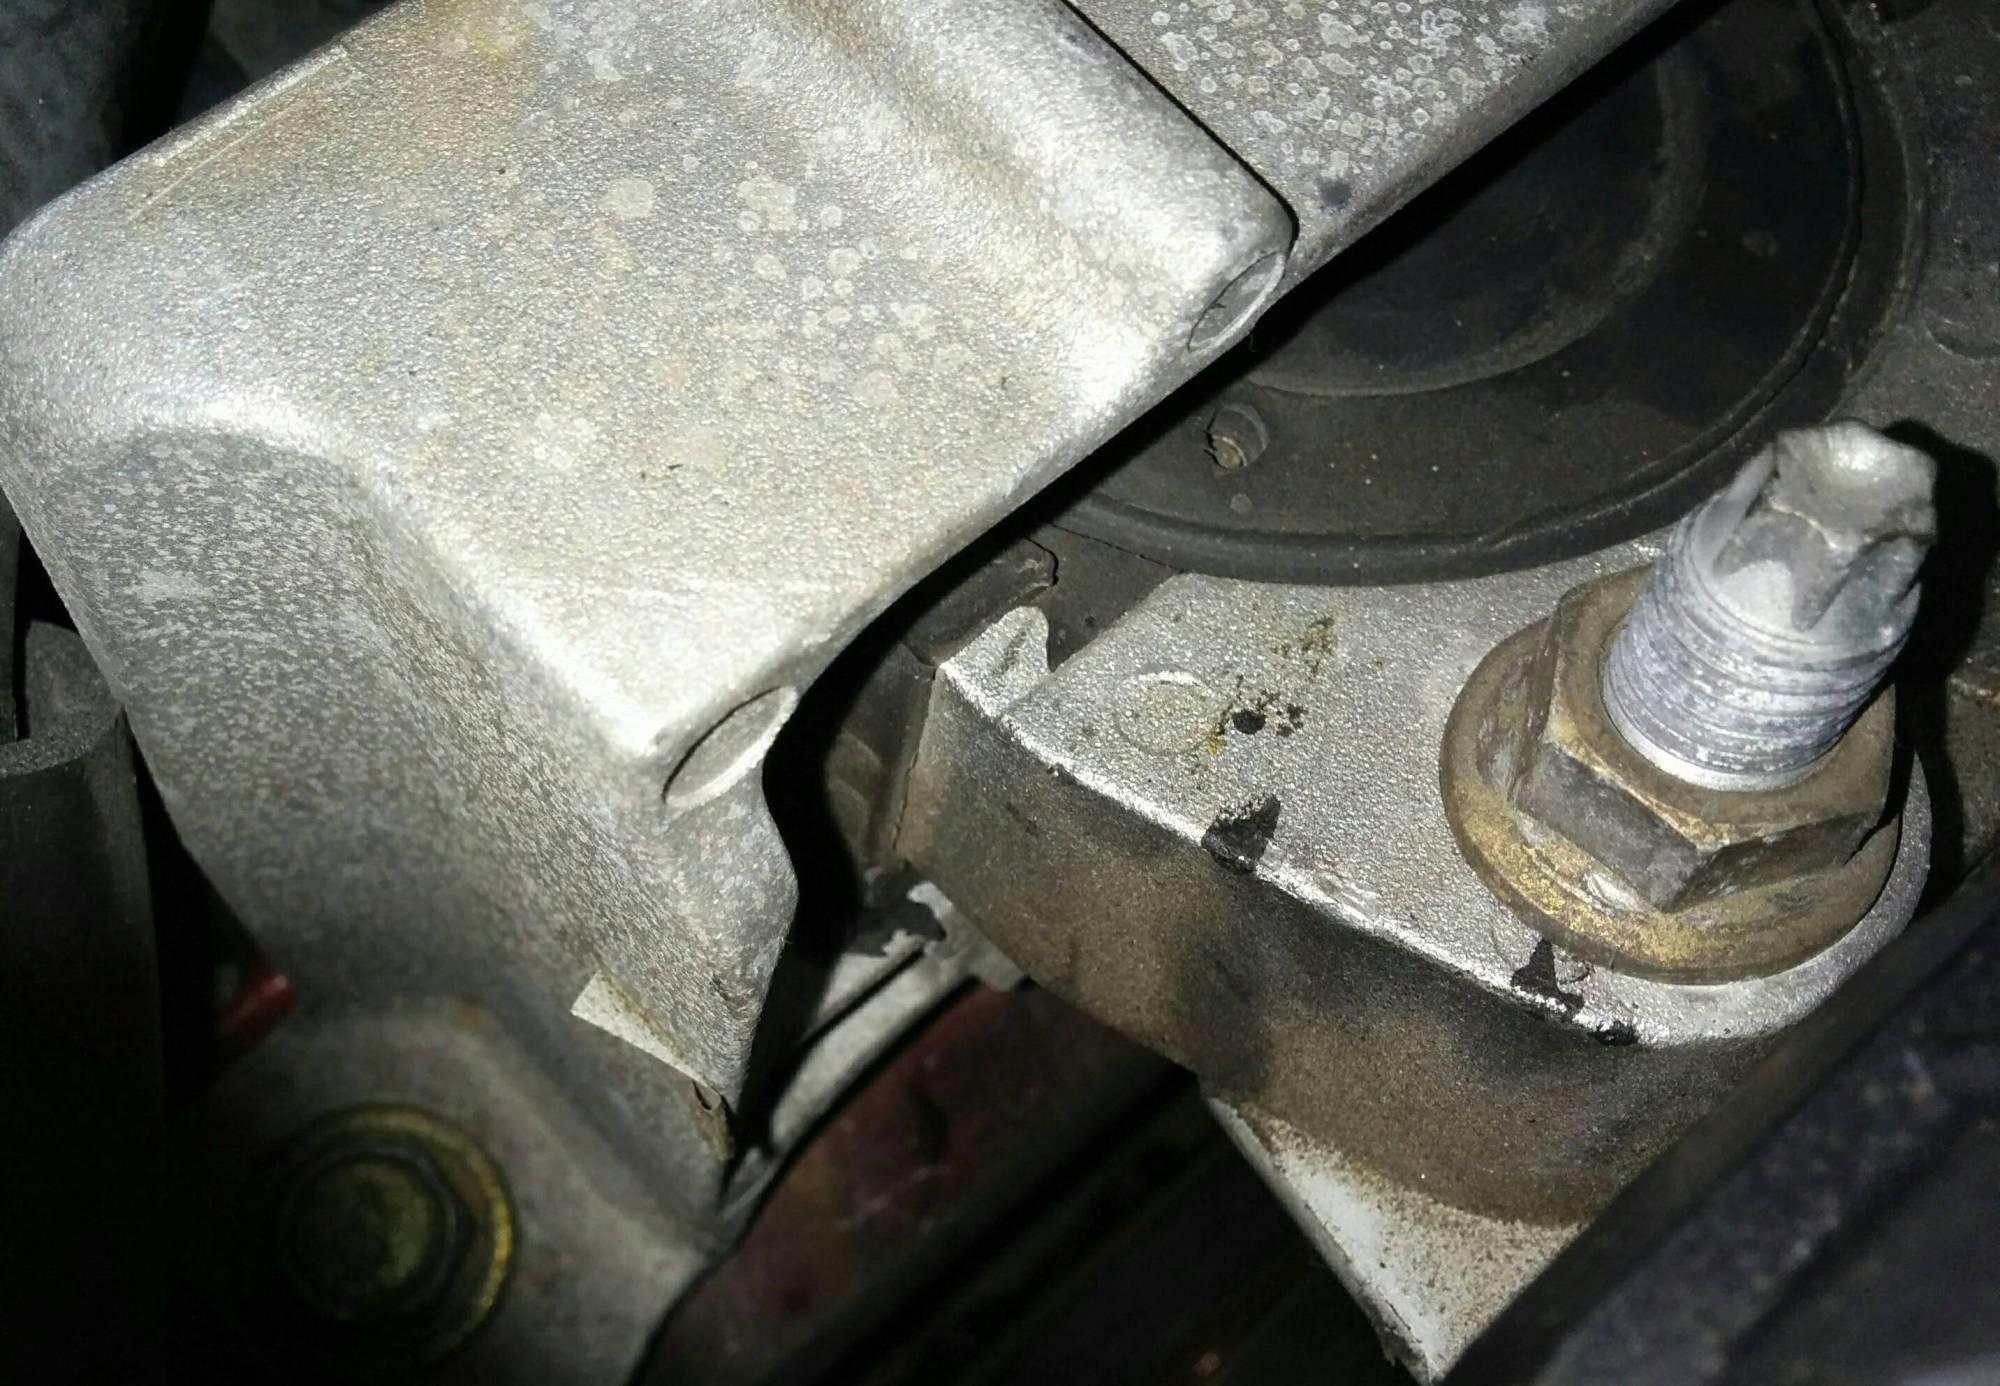 hight resolution of  motor mount side near engine vehicle is 2006 mazda 3